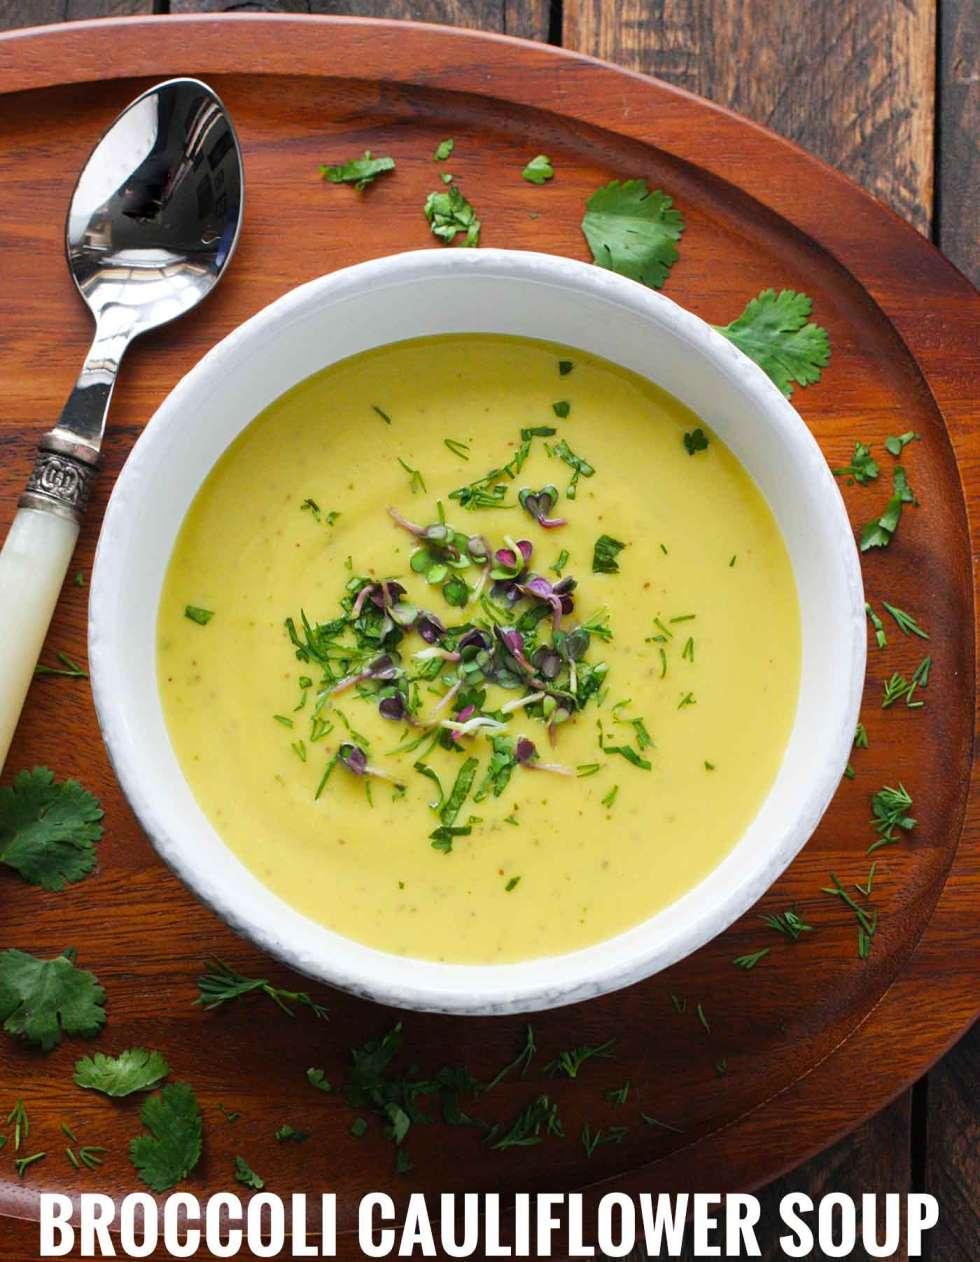 Broccoli Cauliflower Soup   Recipe at SoupAddict.com